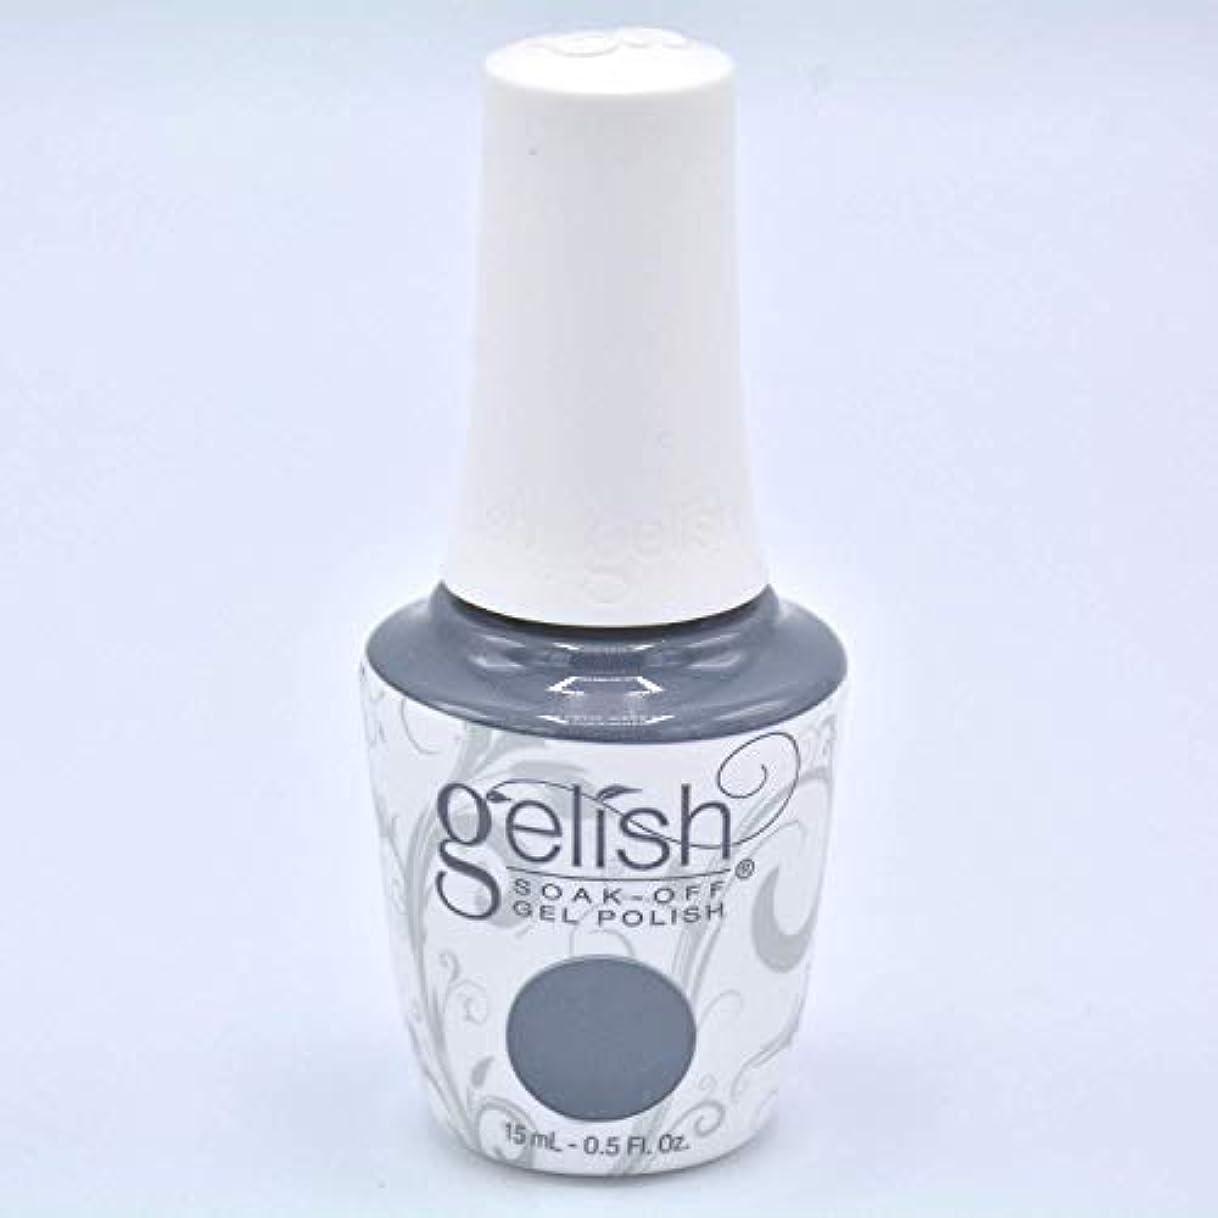 Harmony Gelish - Clean Slate - 0.5oz / 15ml